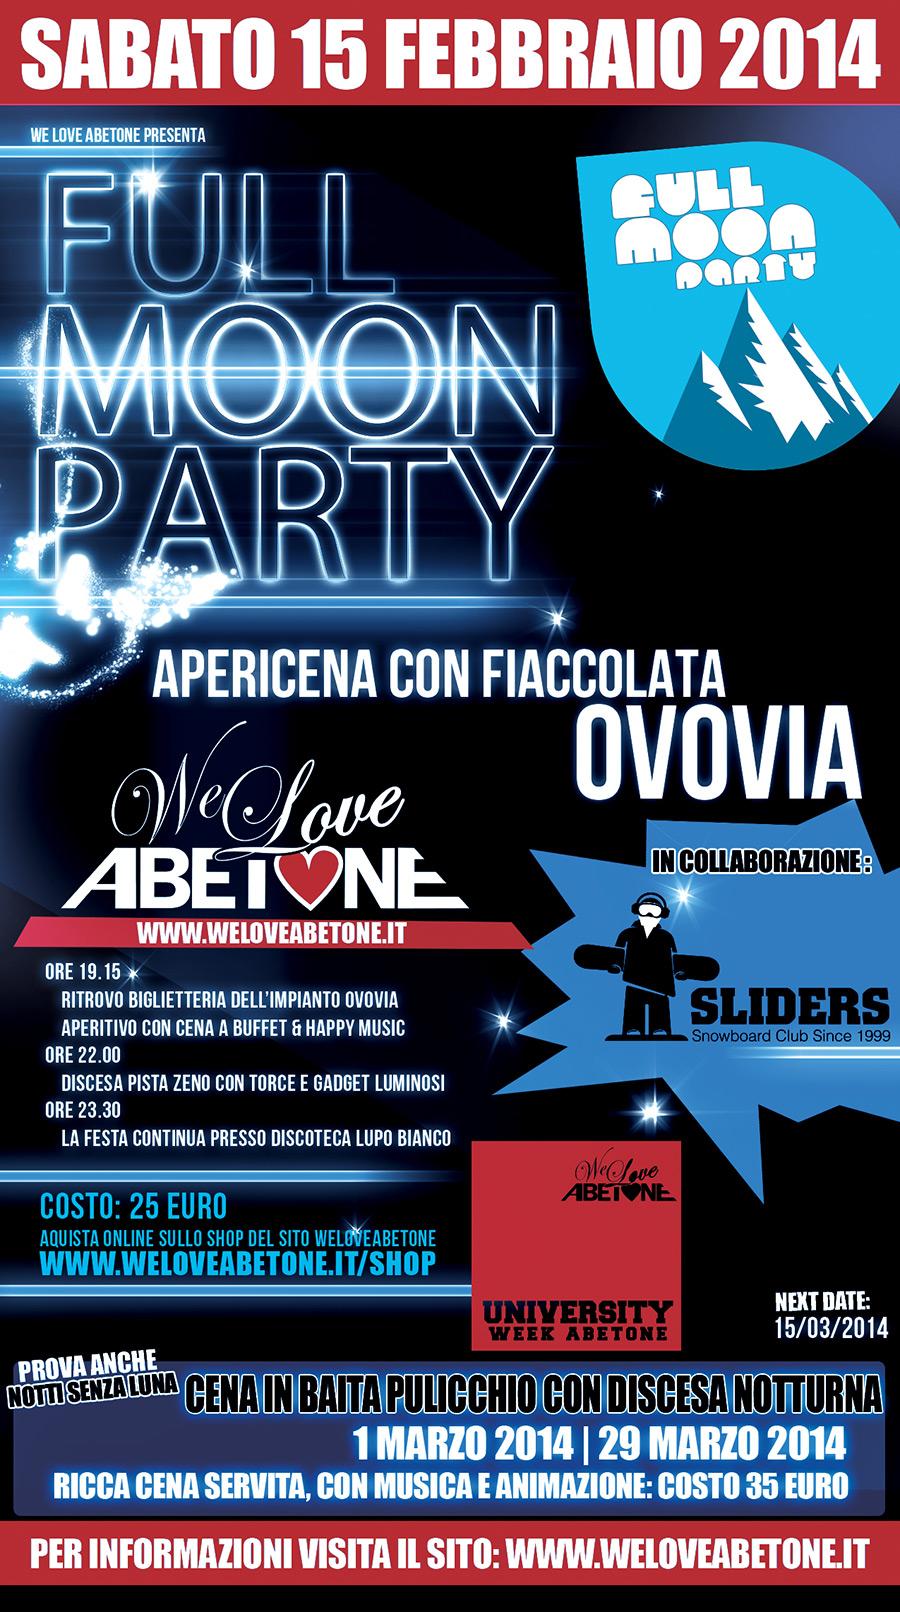 full moon party we love abetone 2014